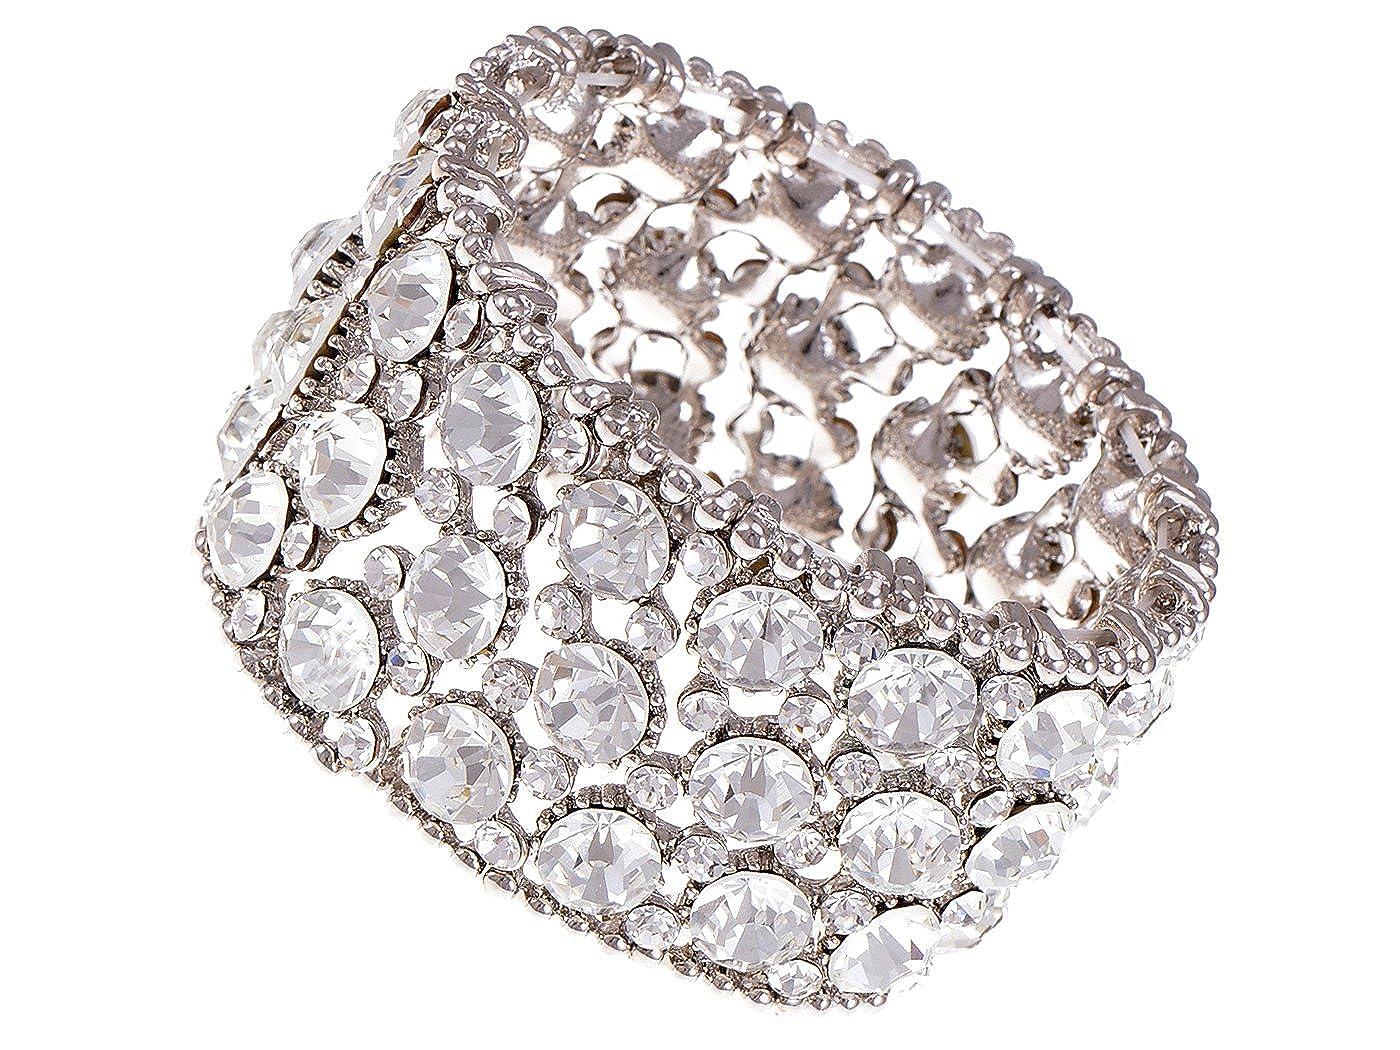 Alilang Chunky Statement Silveryy Shiny Crystal Rhinestone Fashion Bracelet Bangle Cuff S0613